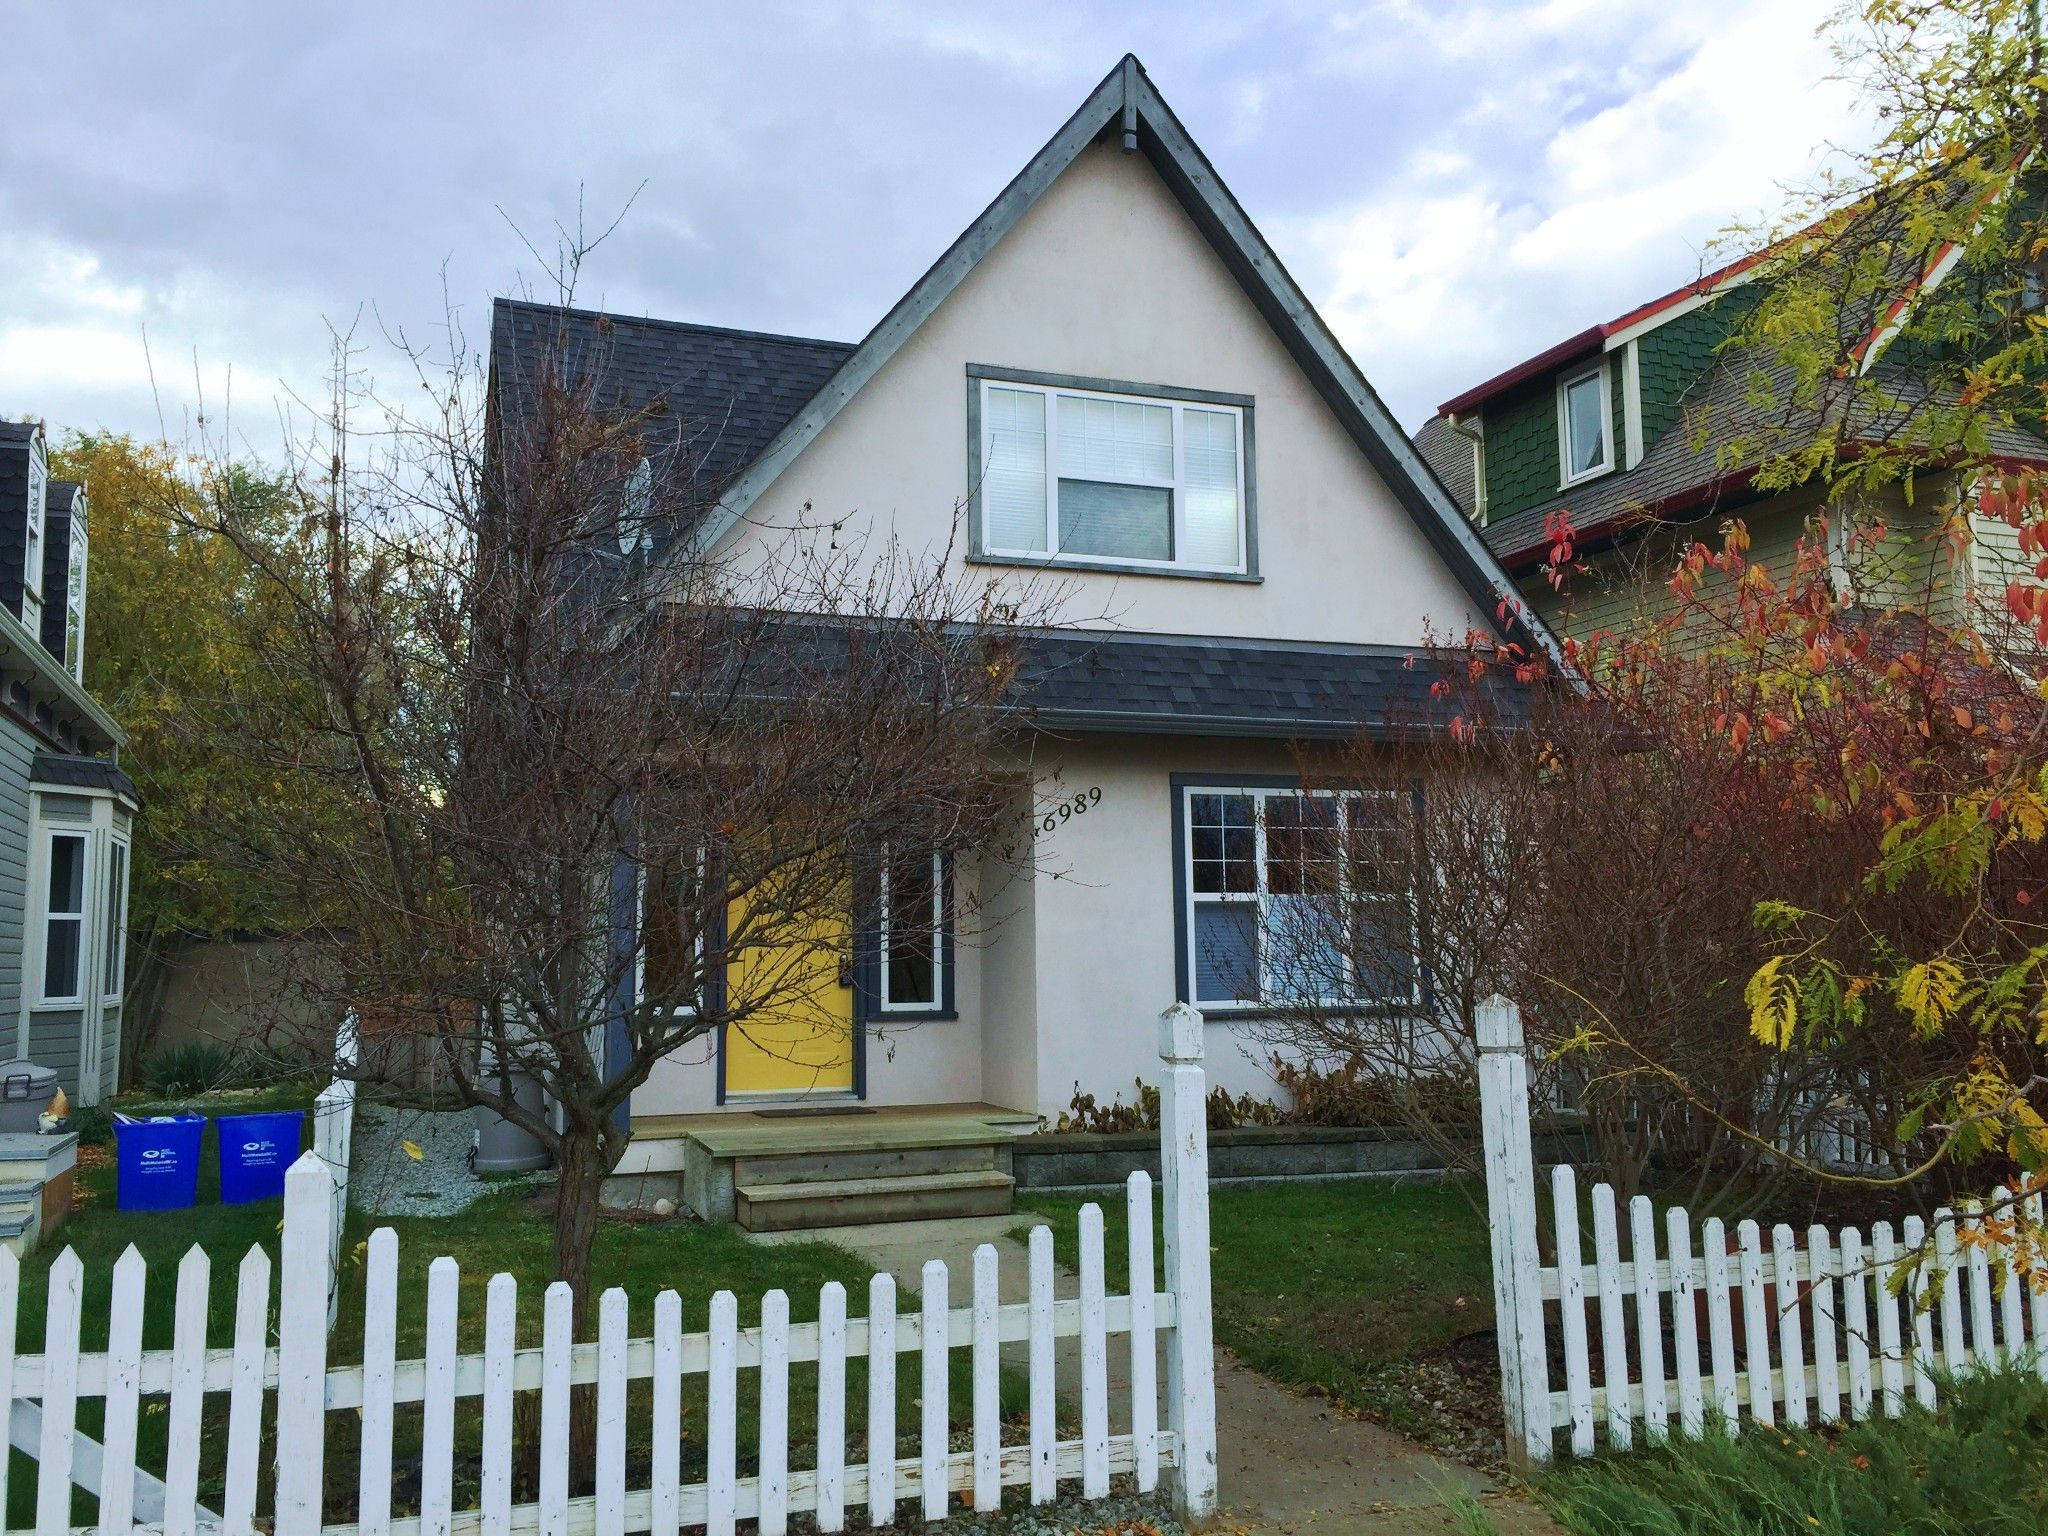 Main Photo: 6989 Cummins Road in Vernon: Okanagan Landing House for sale (North Okanagan)  : MLS®# 10108038